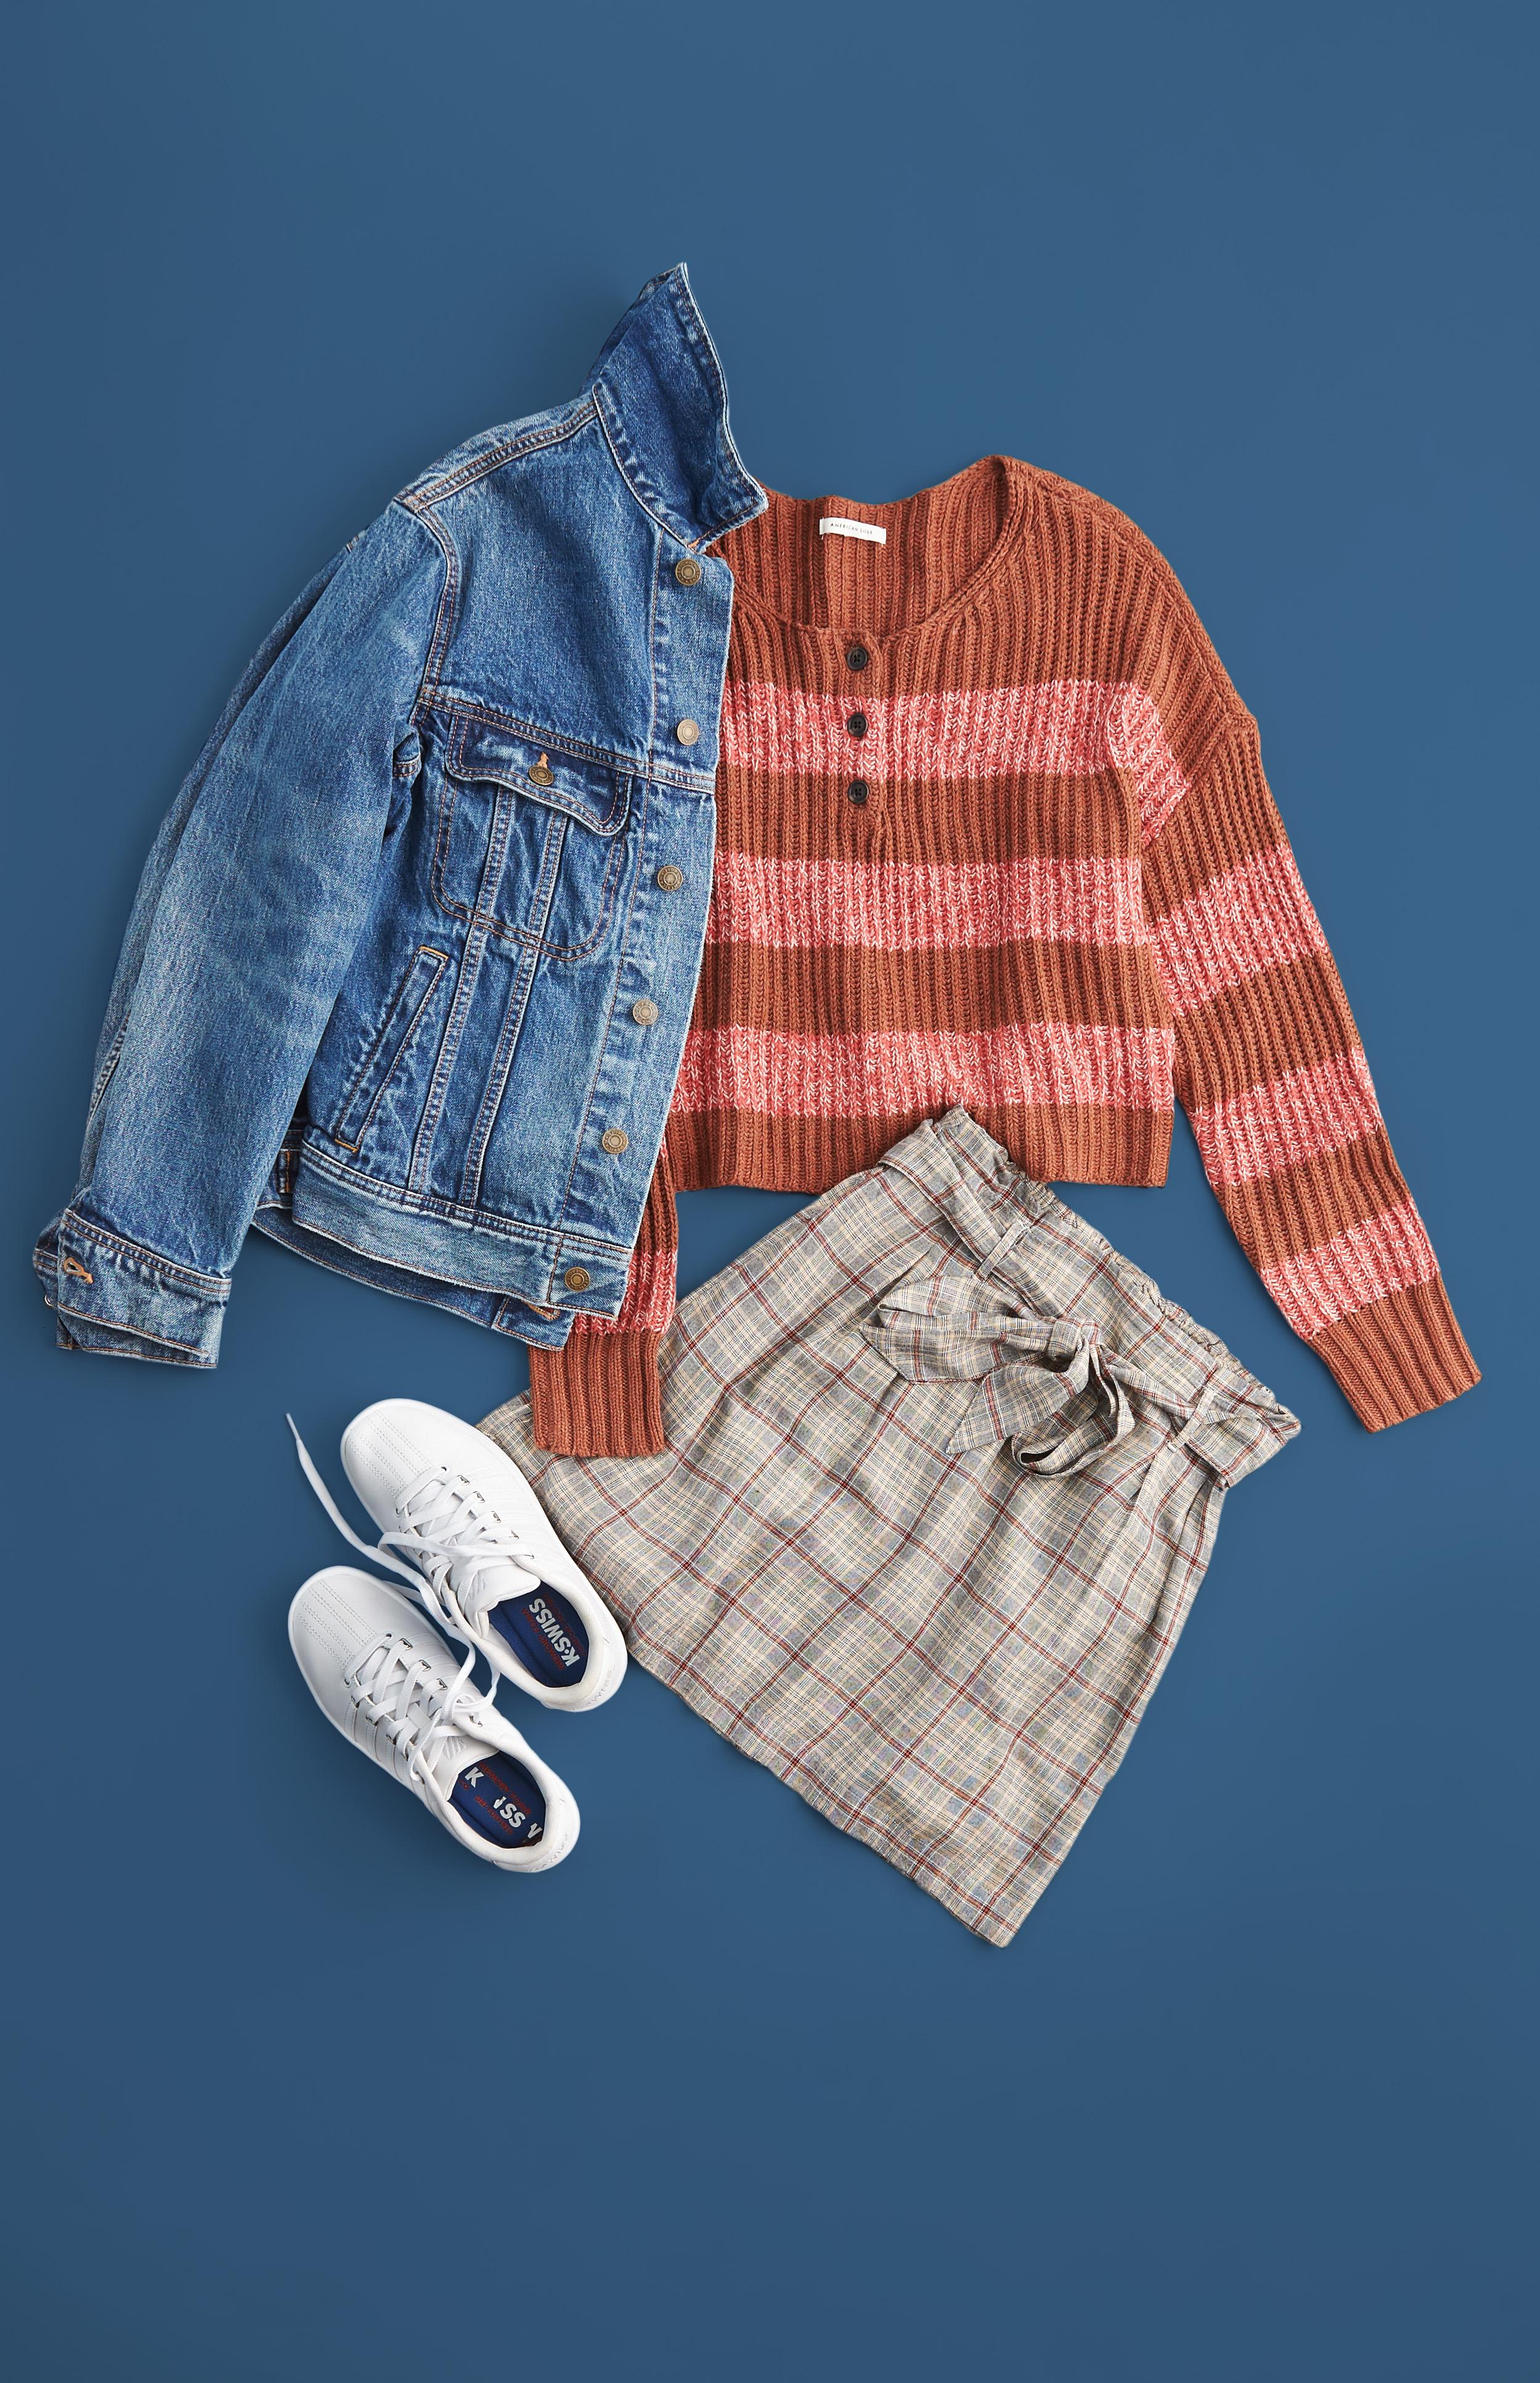 AE Mini Skirt, Henley sweater, and Denim Jacket